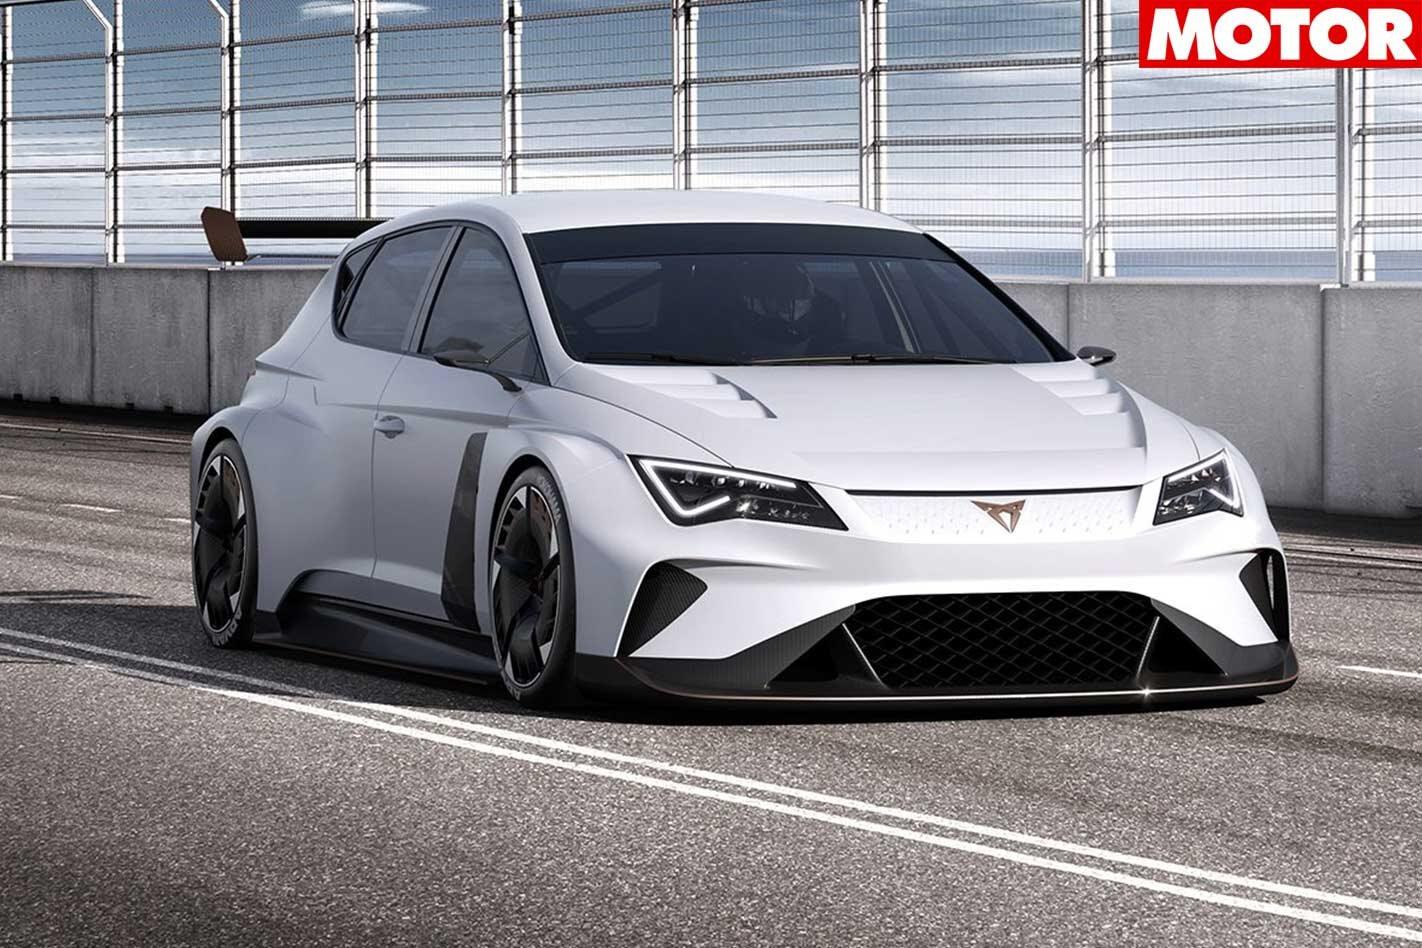 Cupra e Racer to debut at Geneva